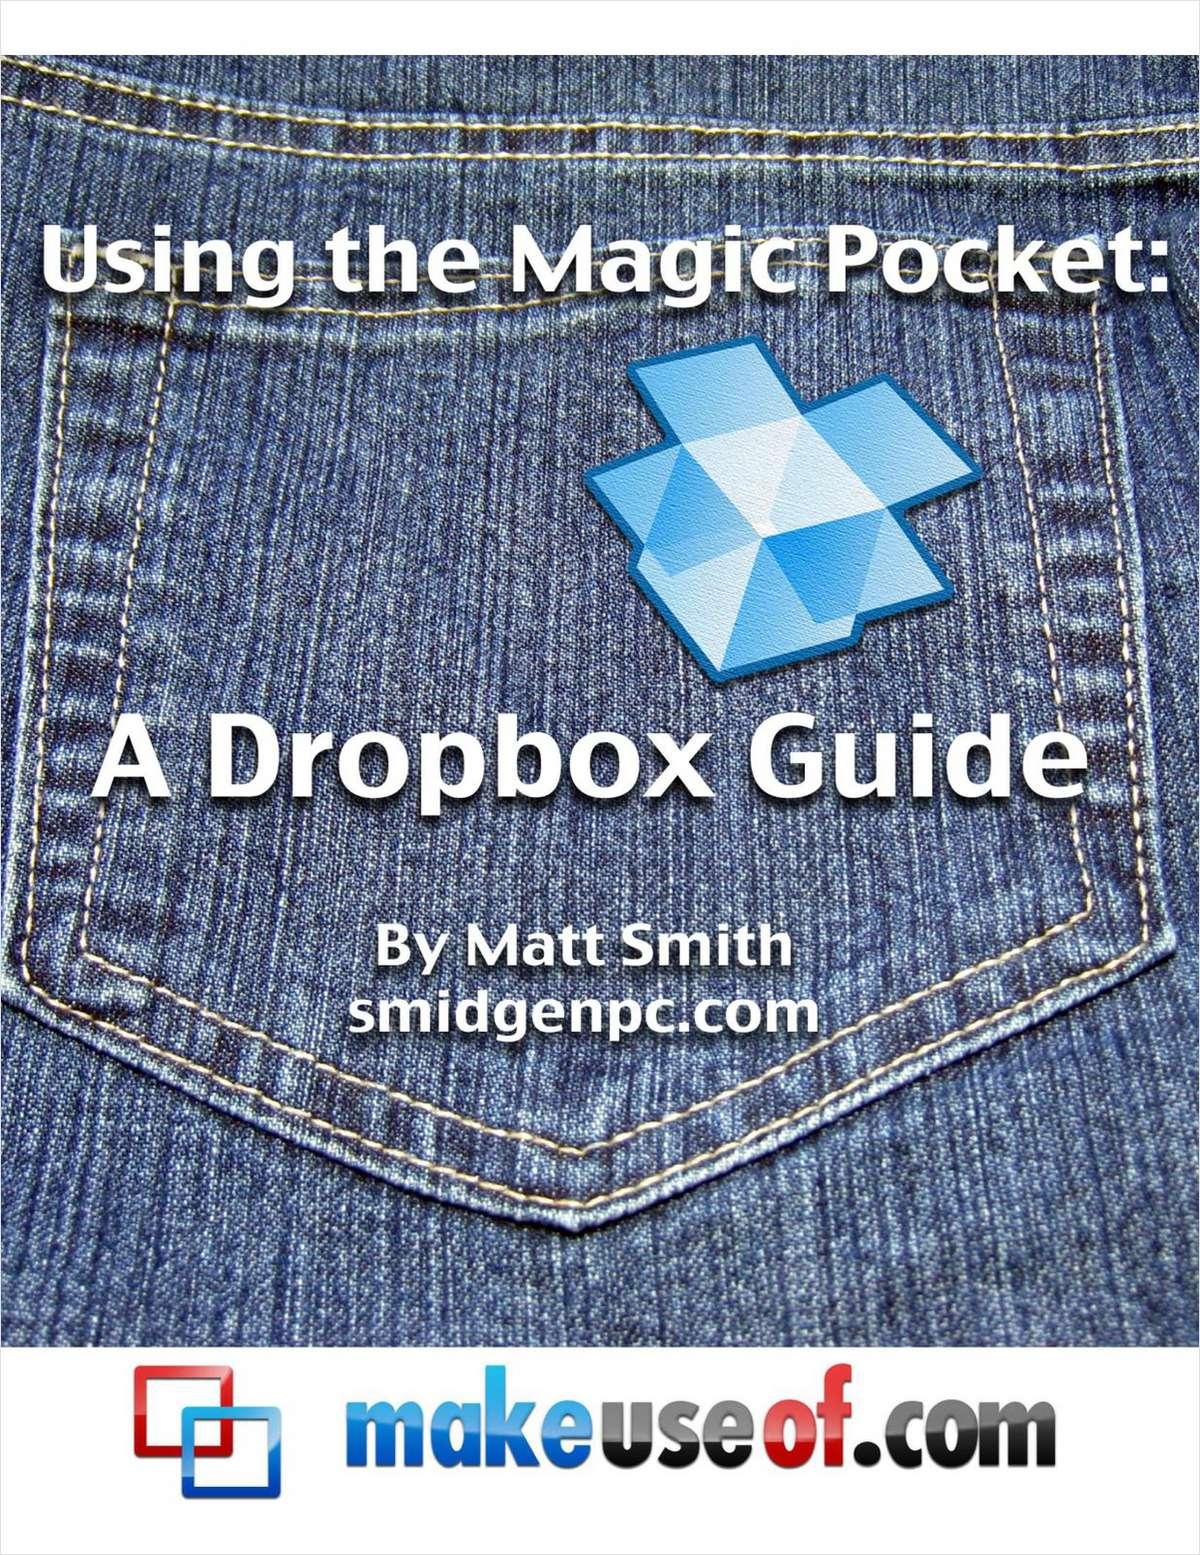 Using the Magic Pocket: A Dropbox Guide